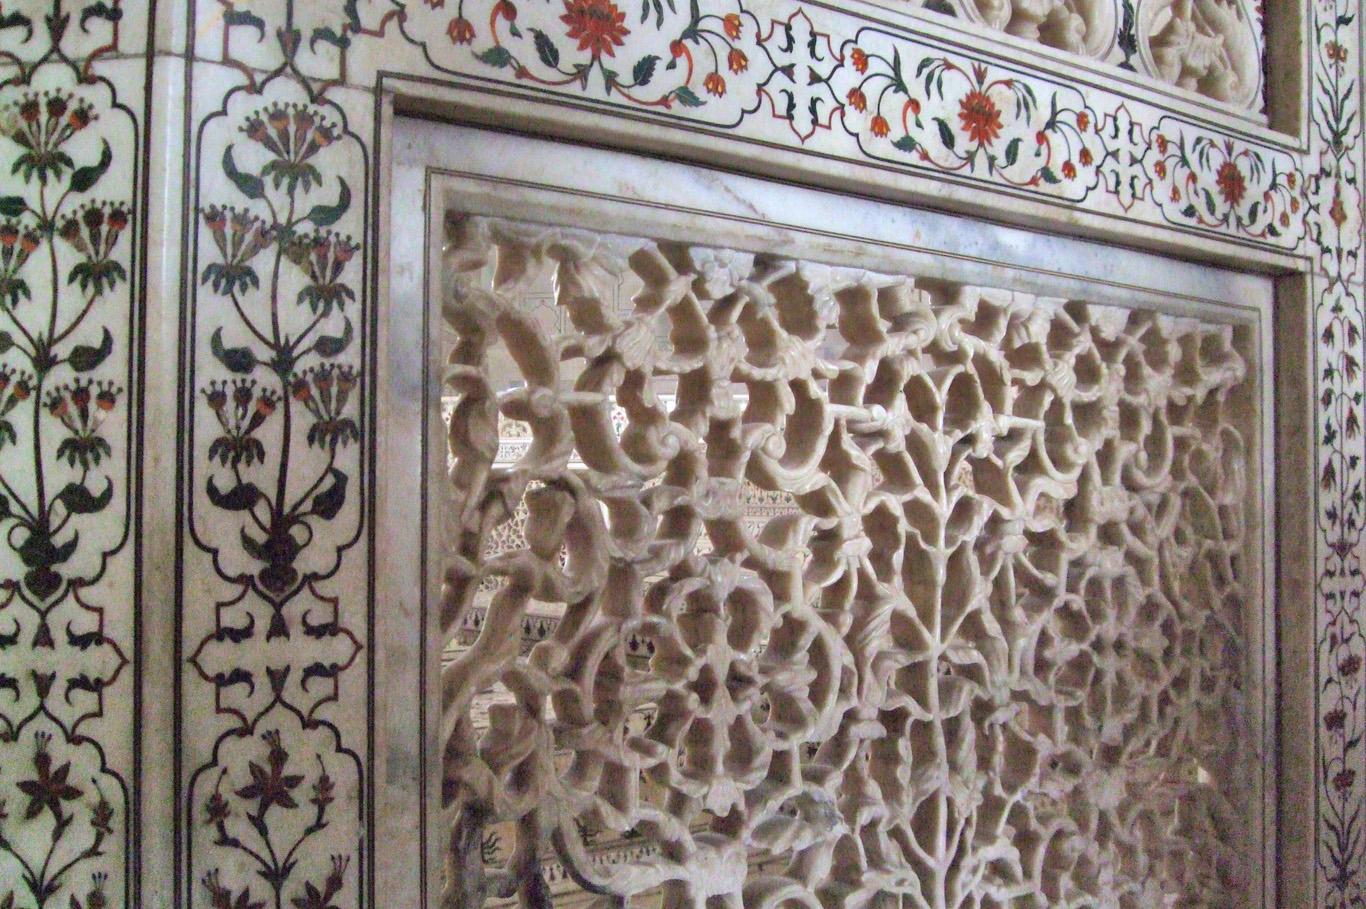 Taj Mahal - Inside the mausoleum